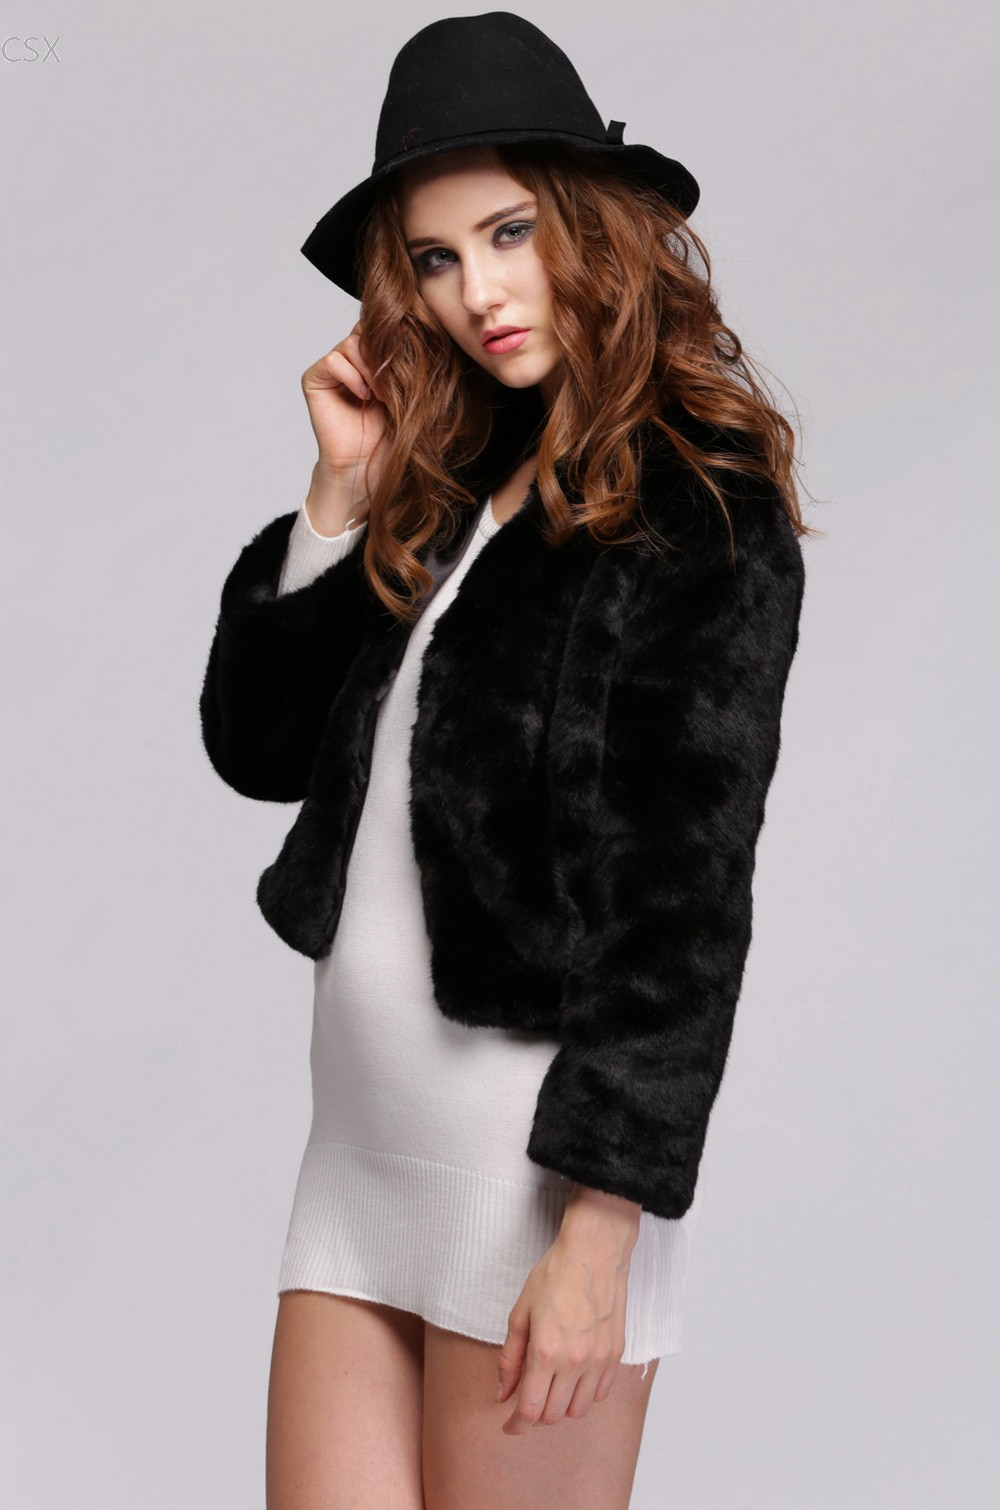 Long White Fur Coat Promotion-Shop for Promotional Long White Fur ...